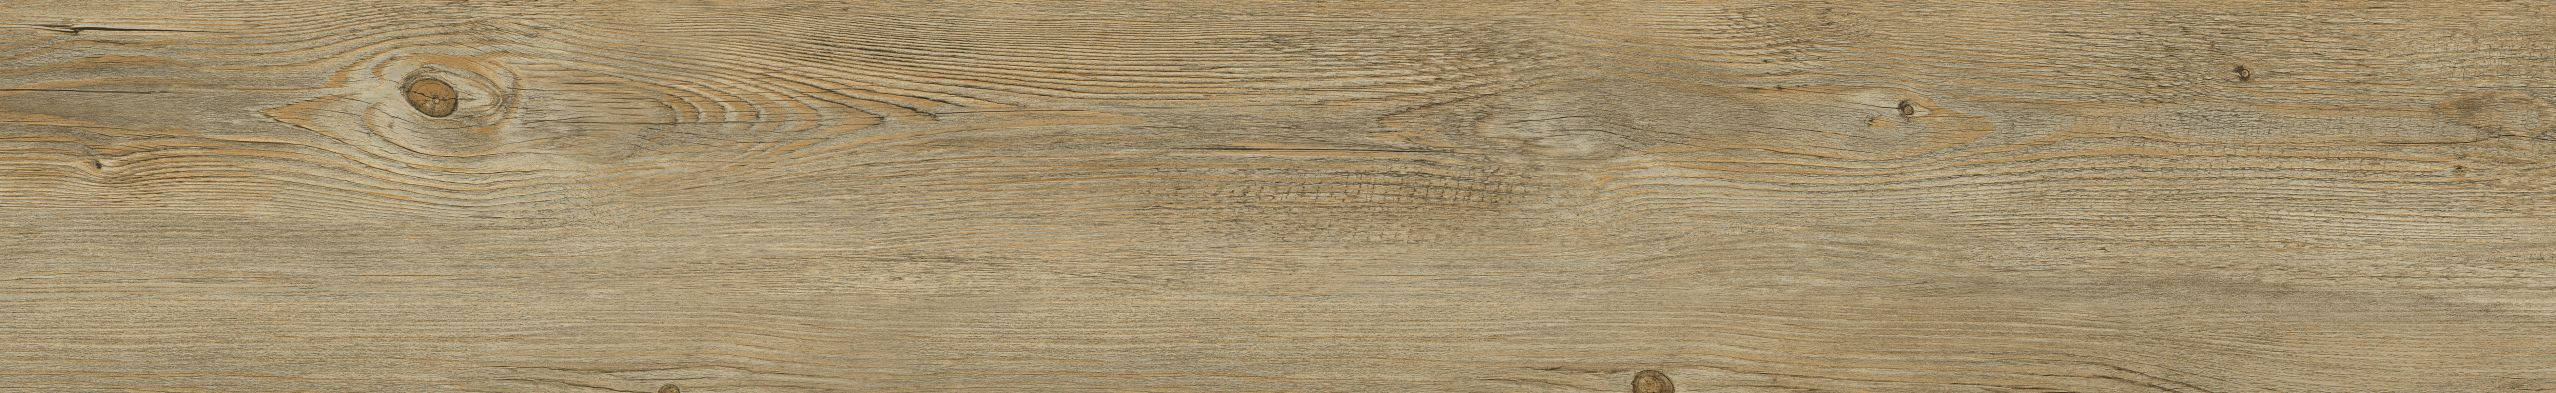 Panele winylowe LVT modulari ® WOOD DRYBACK 19,6 x 132 cm 24243